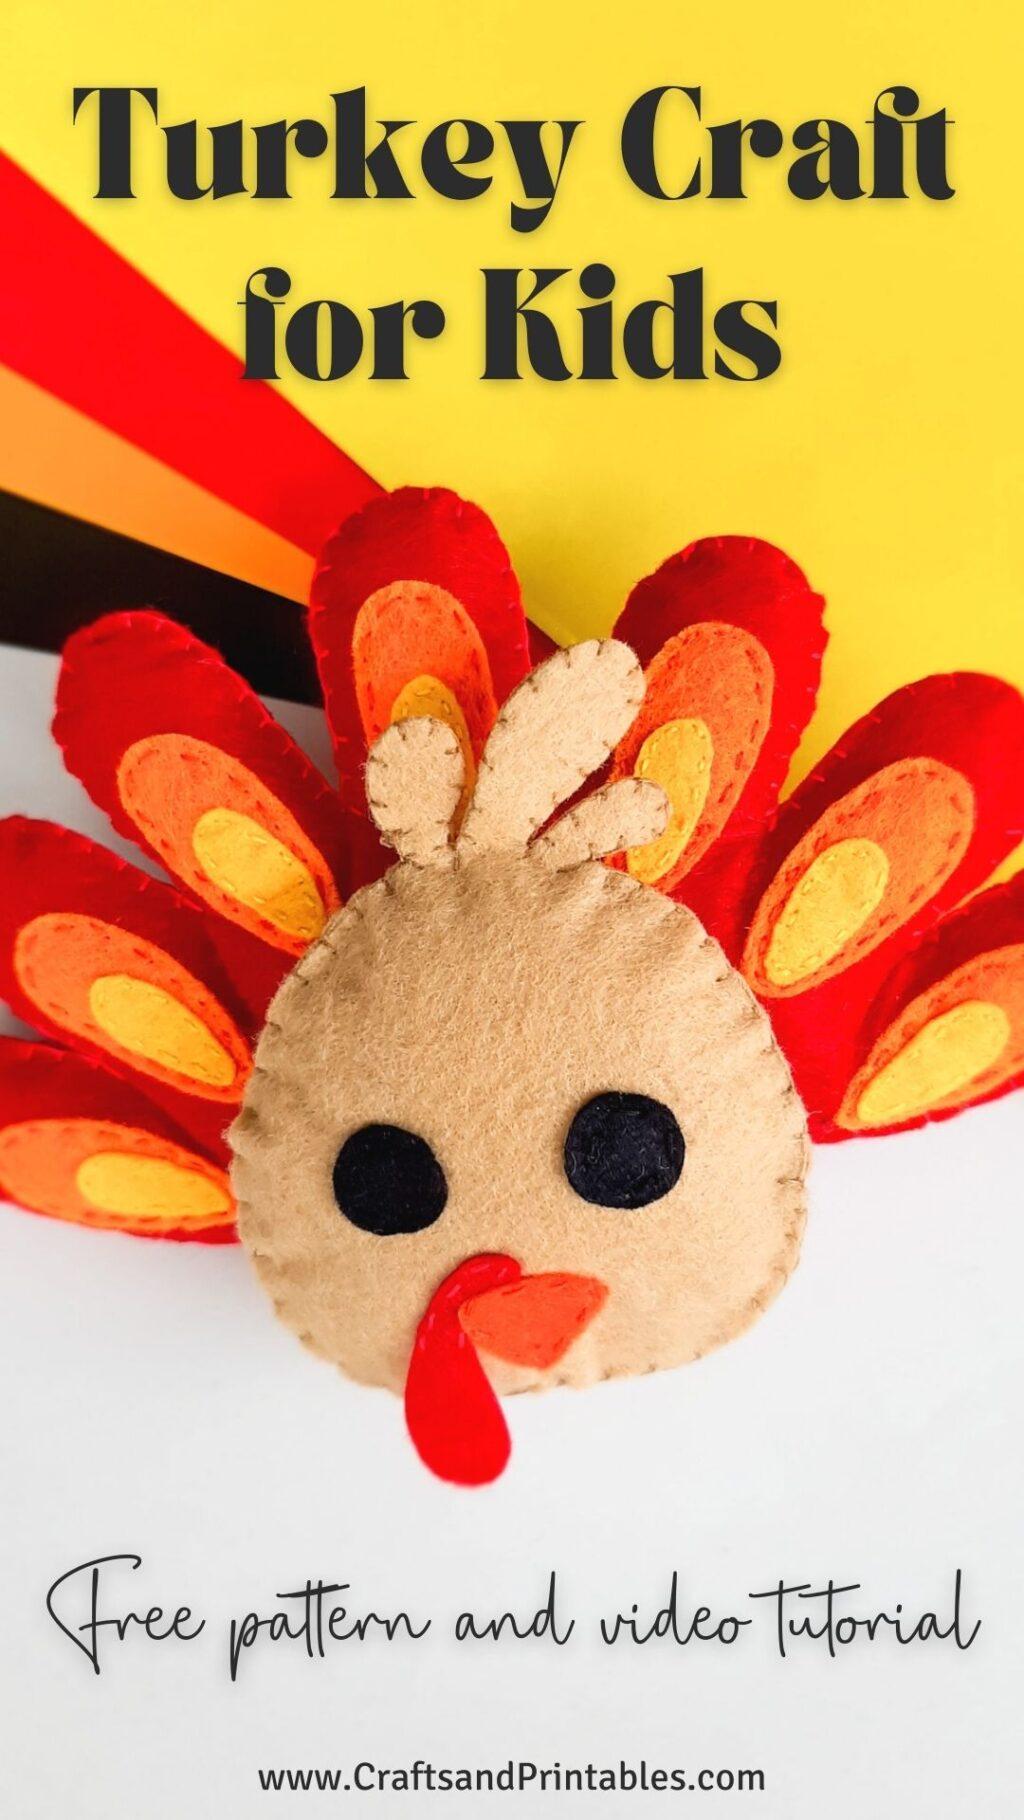 Cute Turkey Craft for Kids PIN